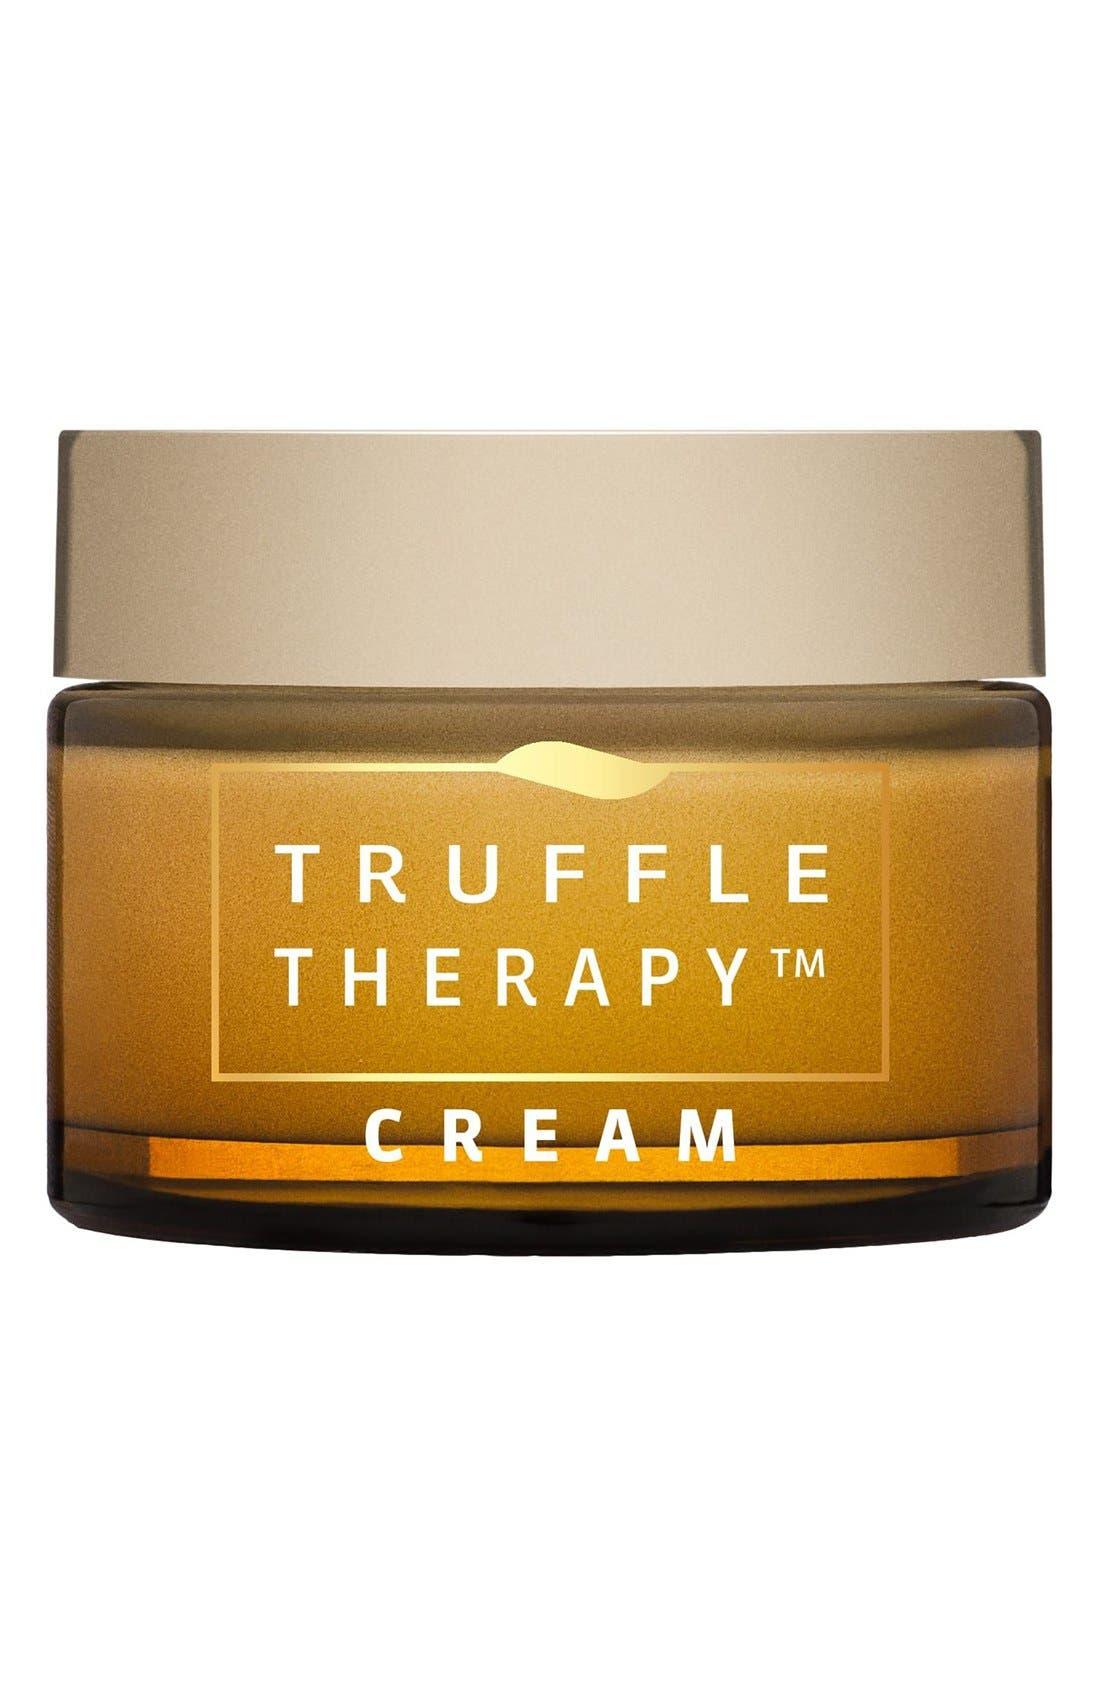 SKIN&CO Truffle Therapy Cream,                             Main thumbnail 1, color,                             000